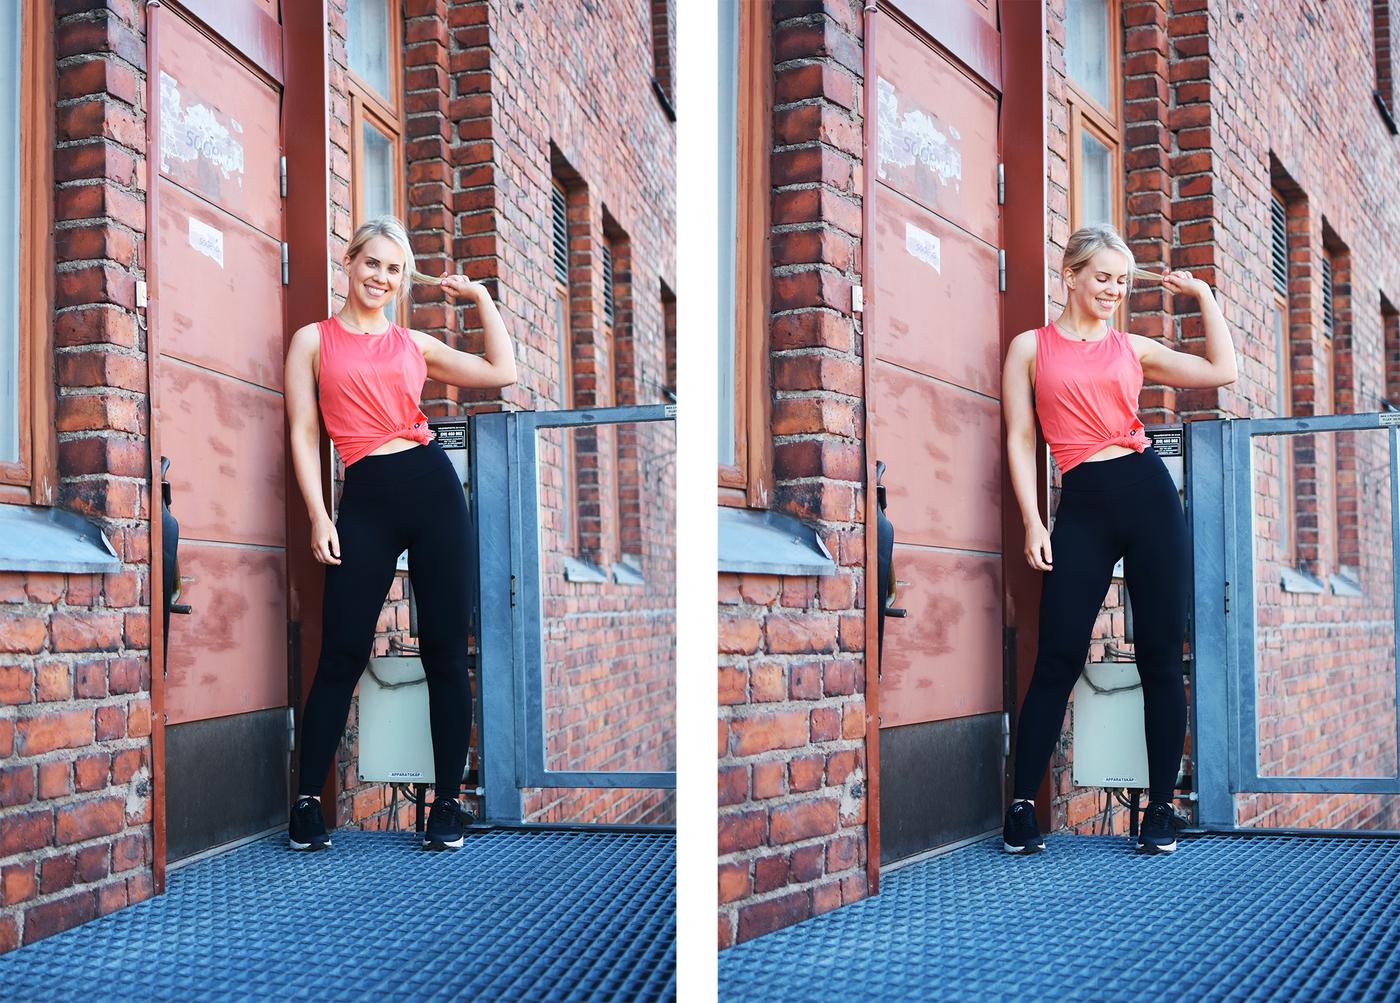 nepra-activewear-sundayblondie-3.jpg